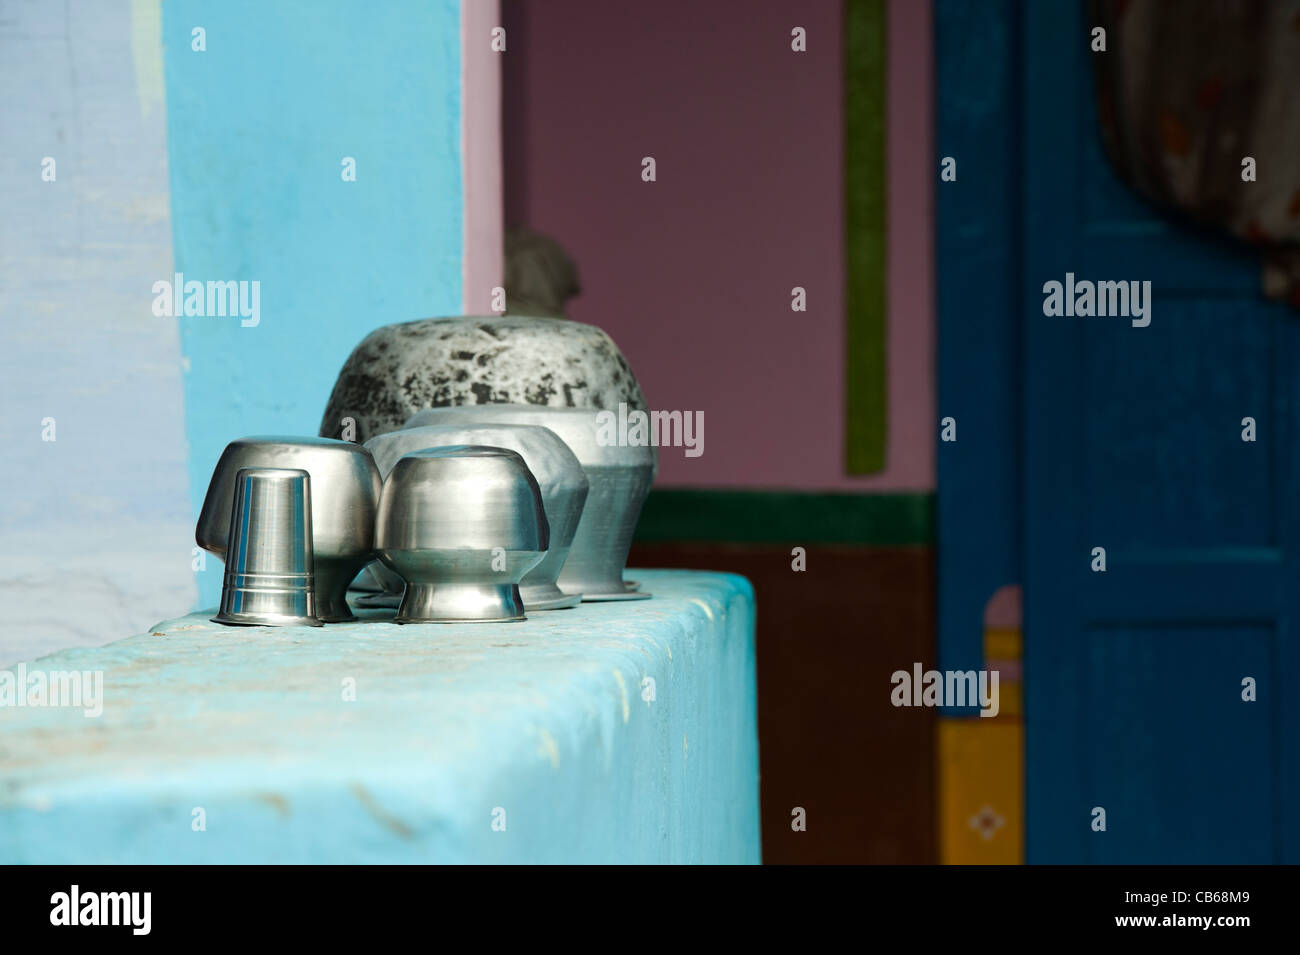 Indian Kitchen Utensils Stock Photos & Indian Kitchen Utensils Stock ...